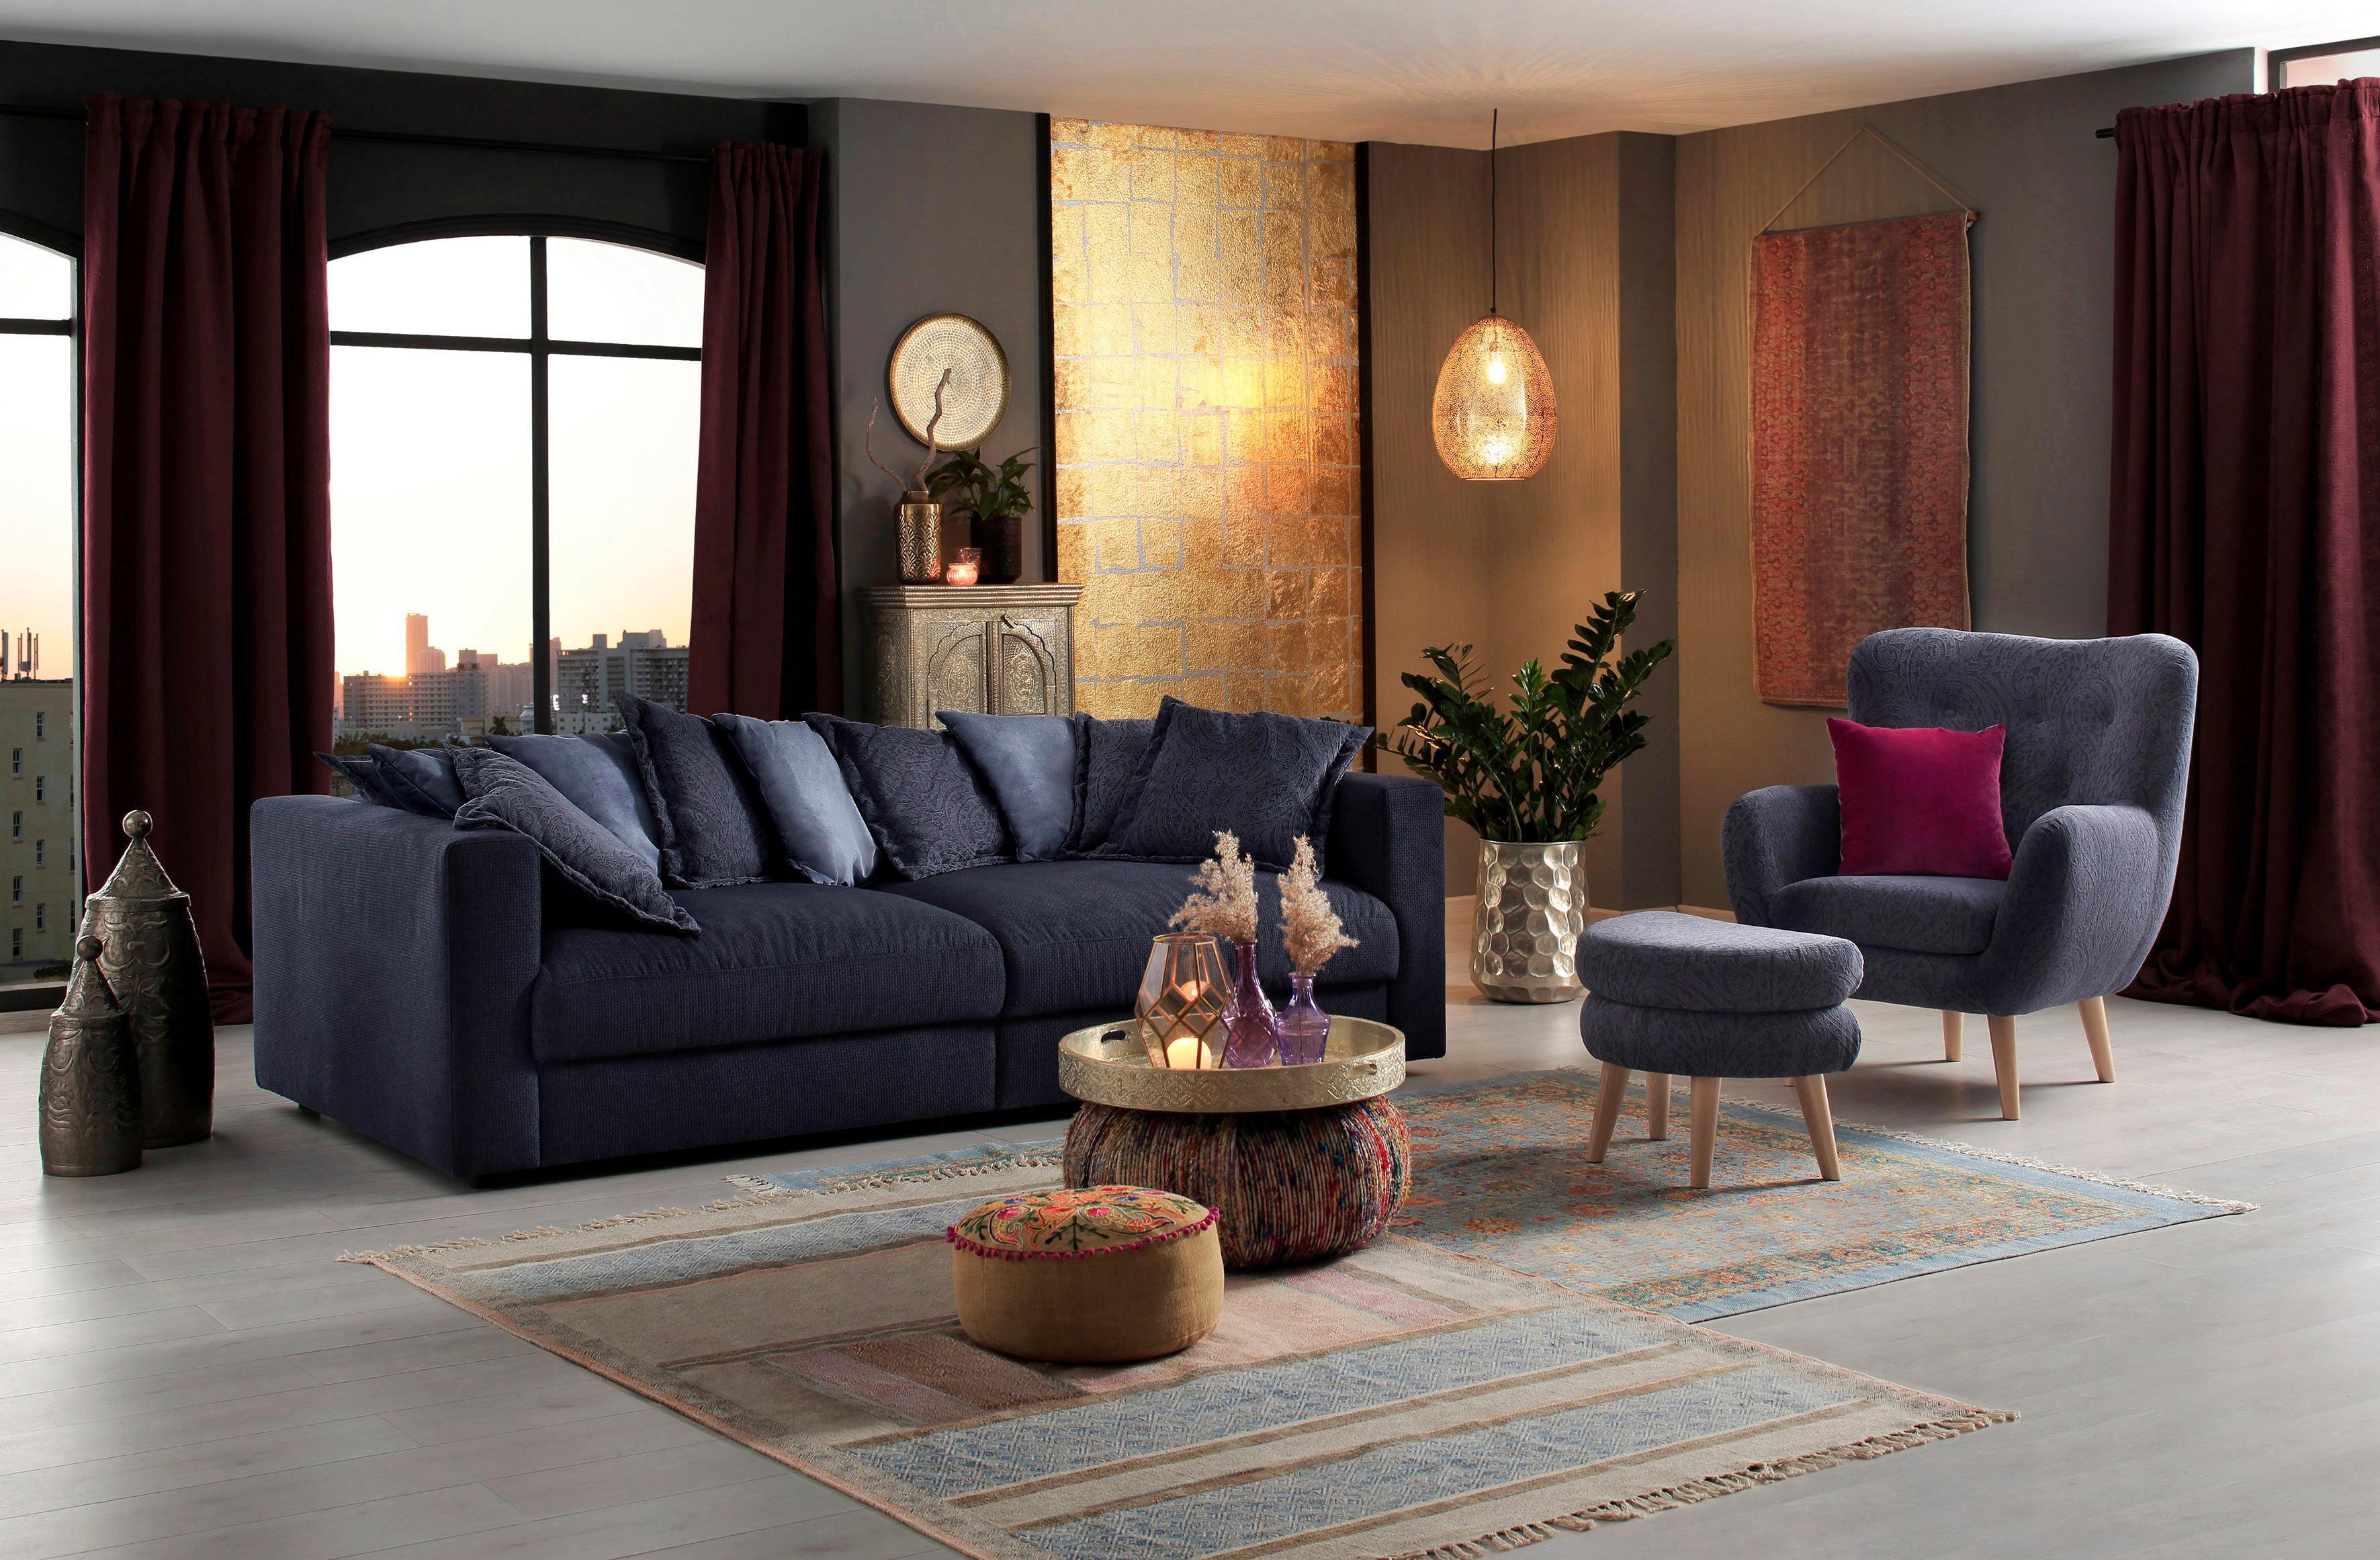 Home affaire Loungesessel Hartland